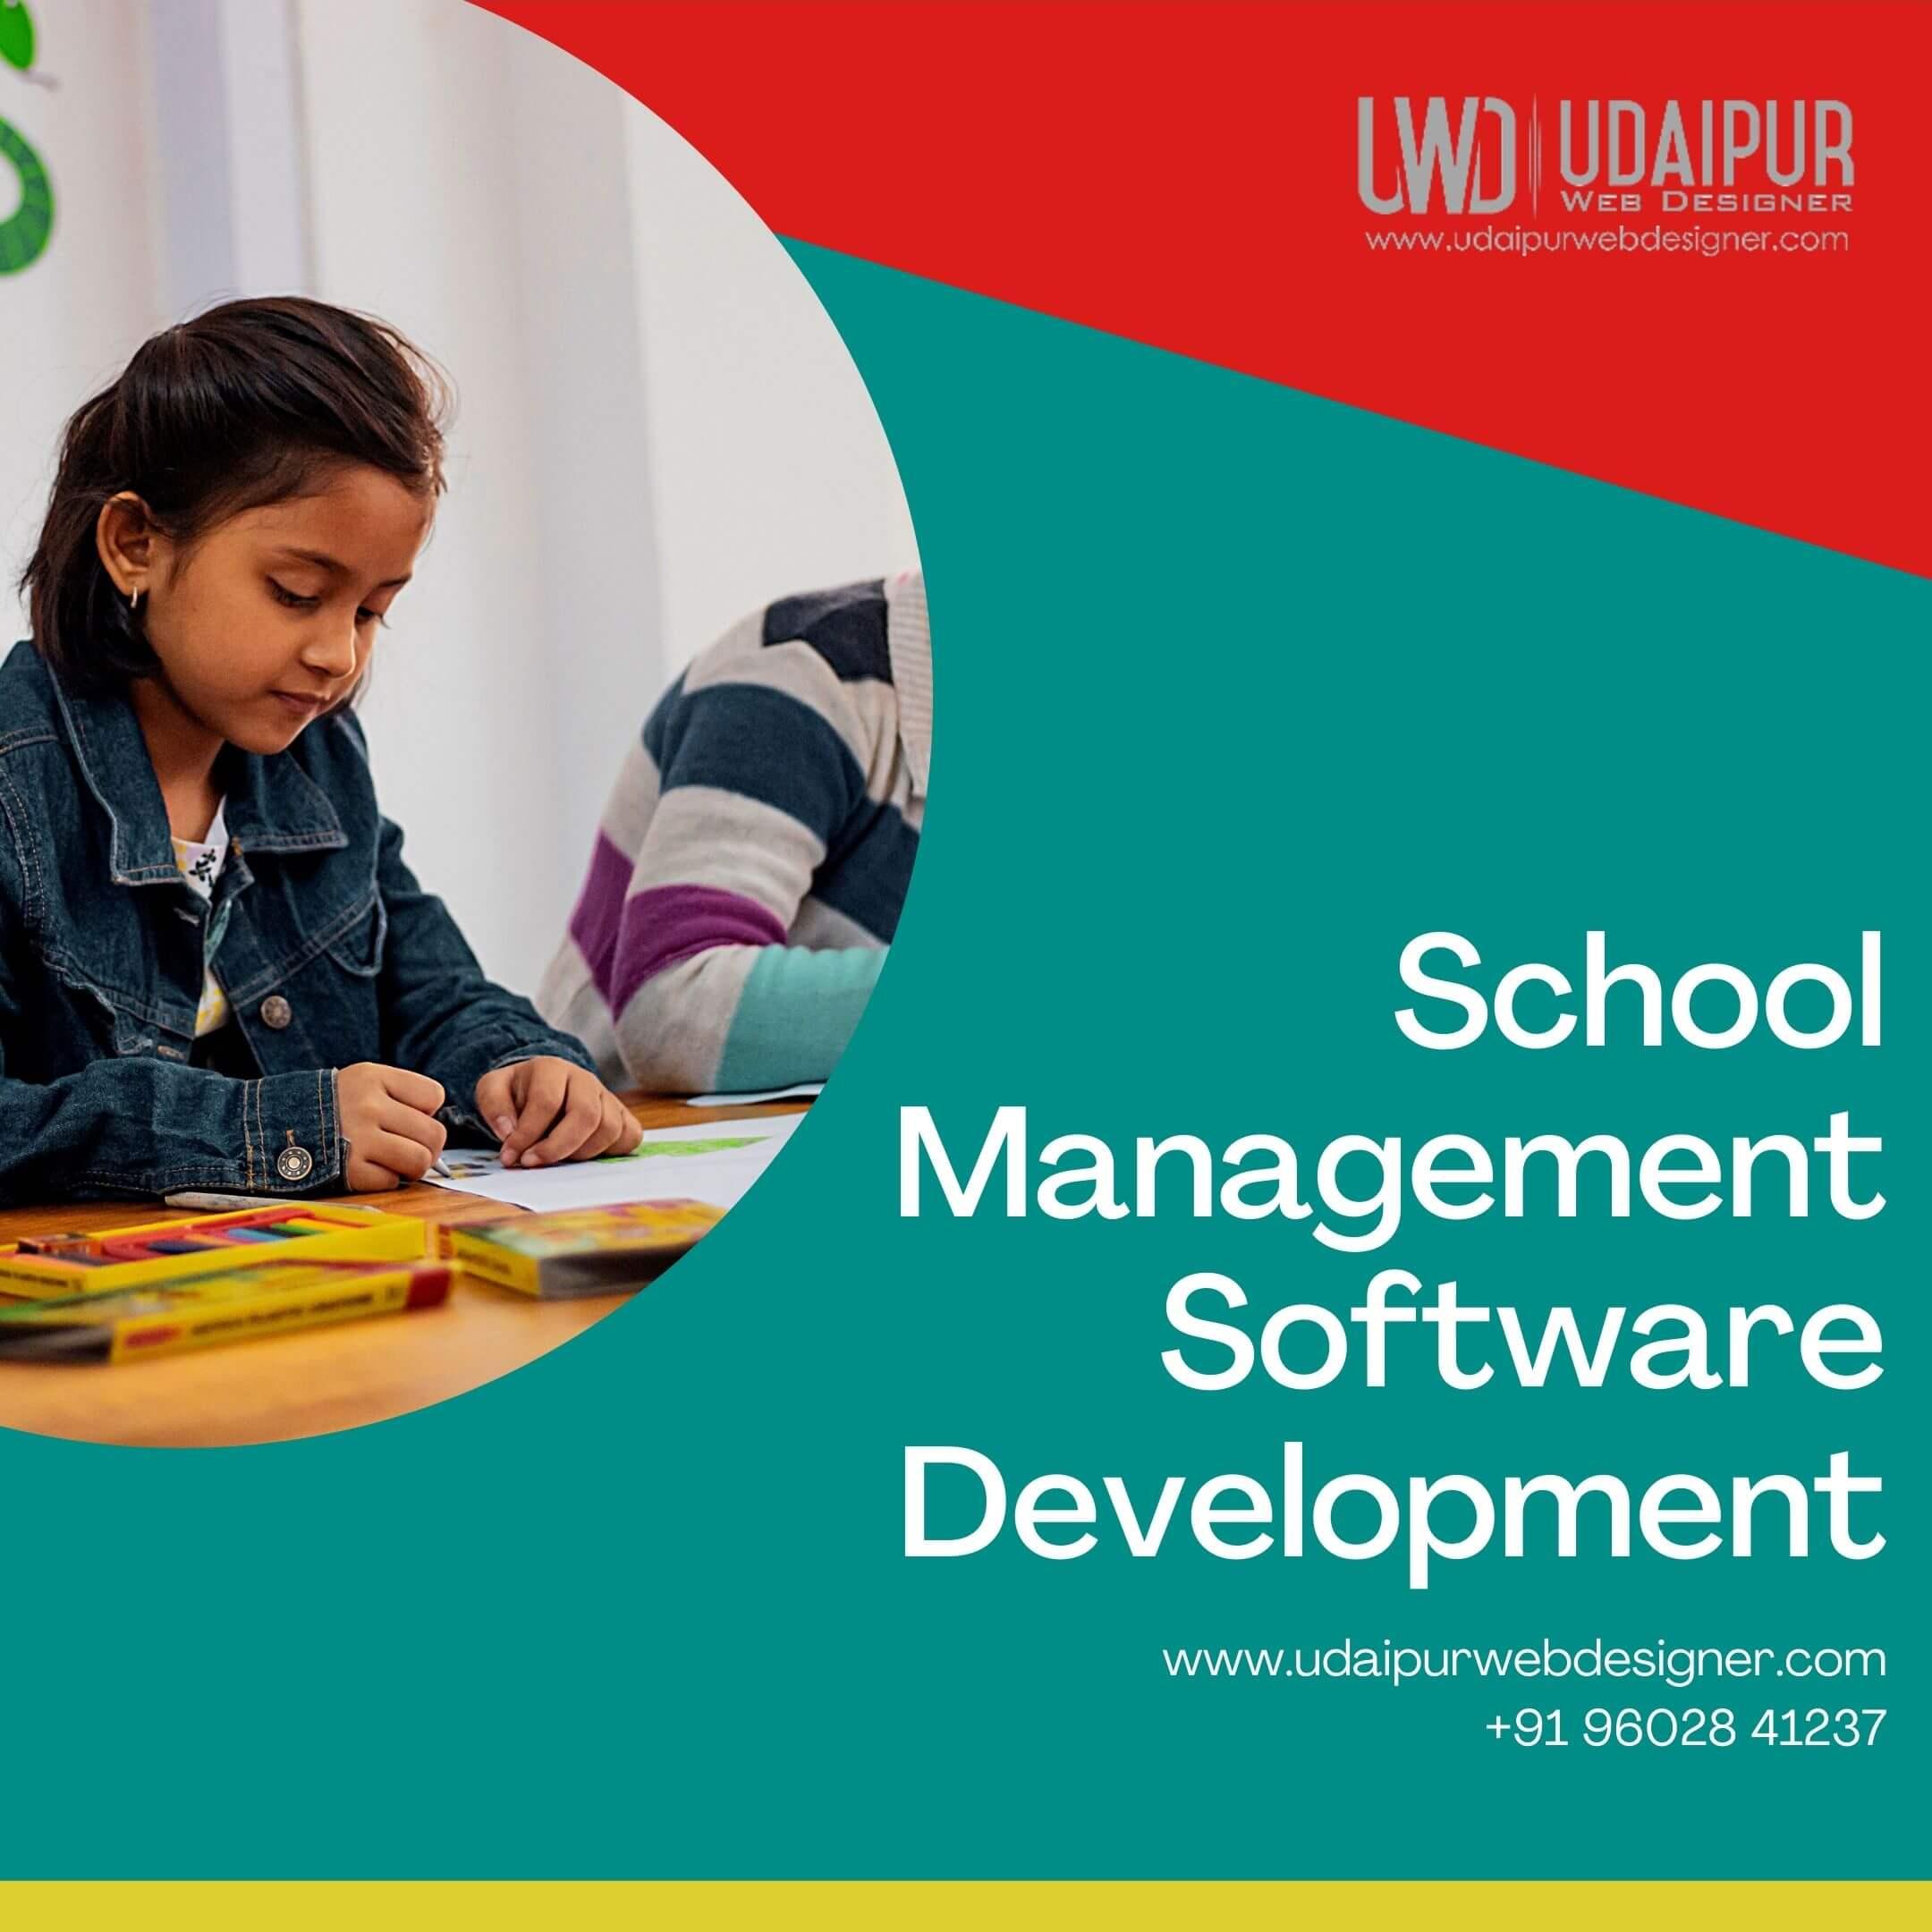 School Management Software in Udaipur